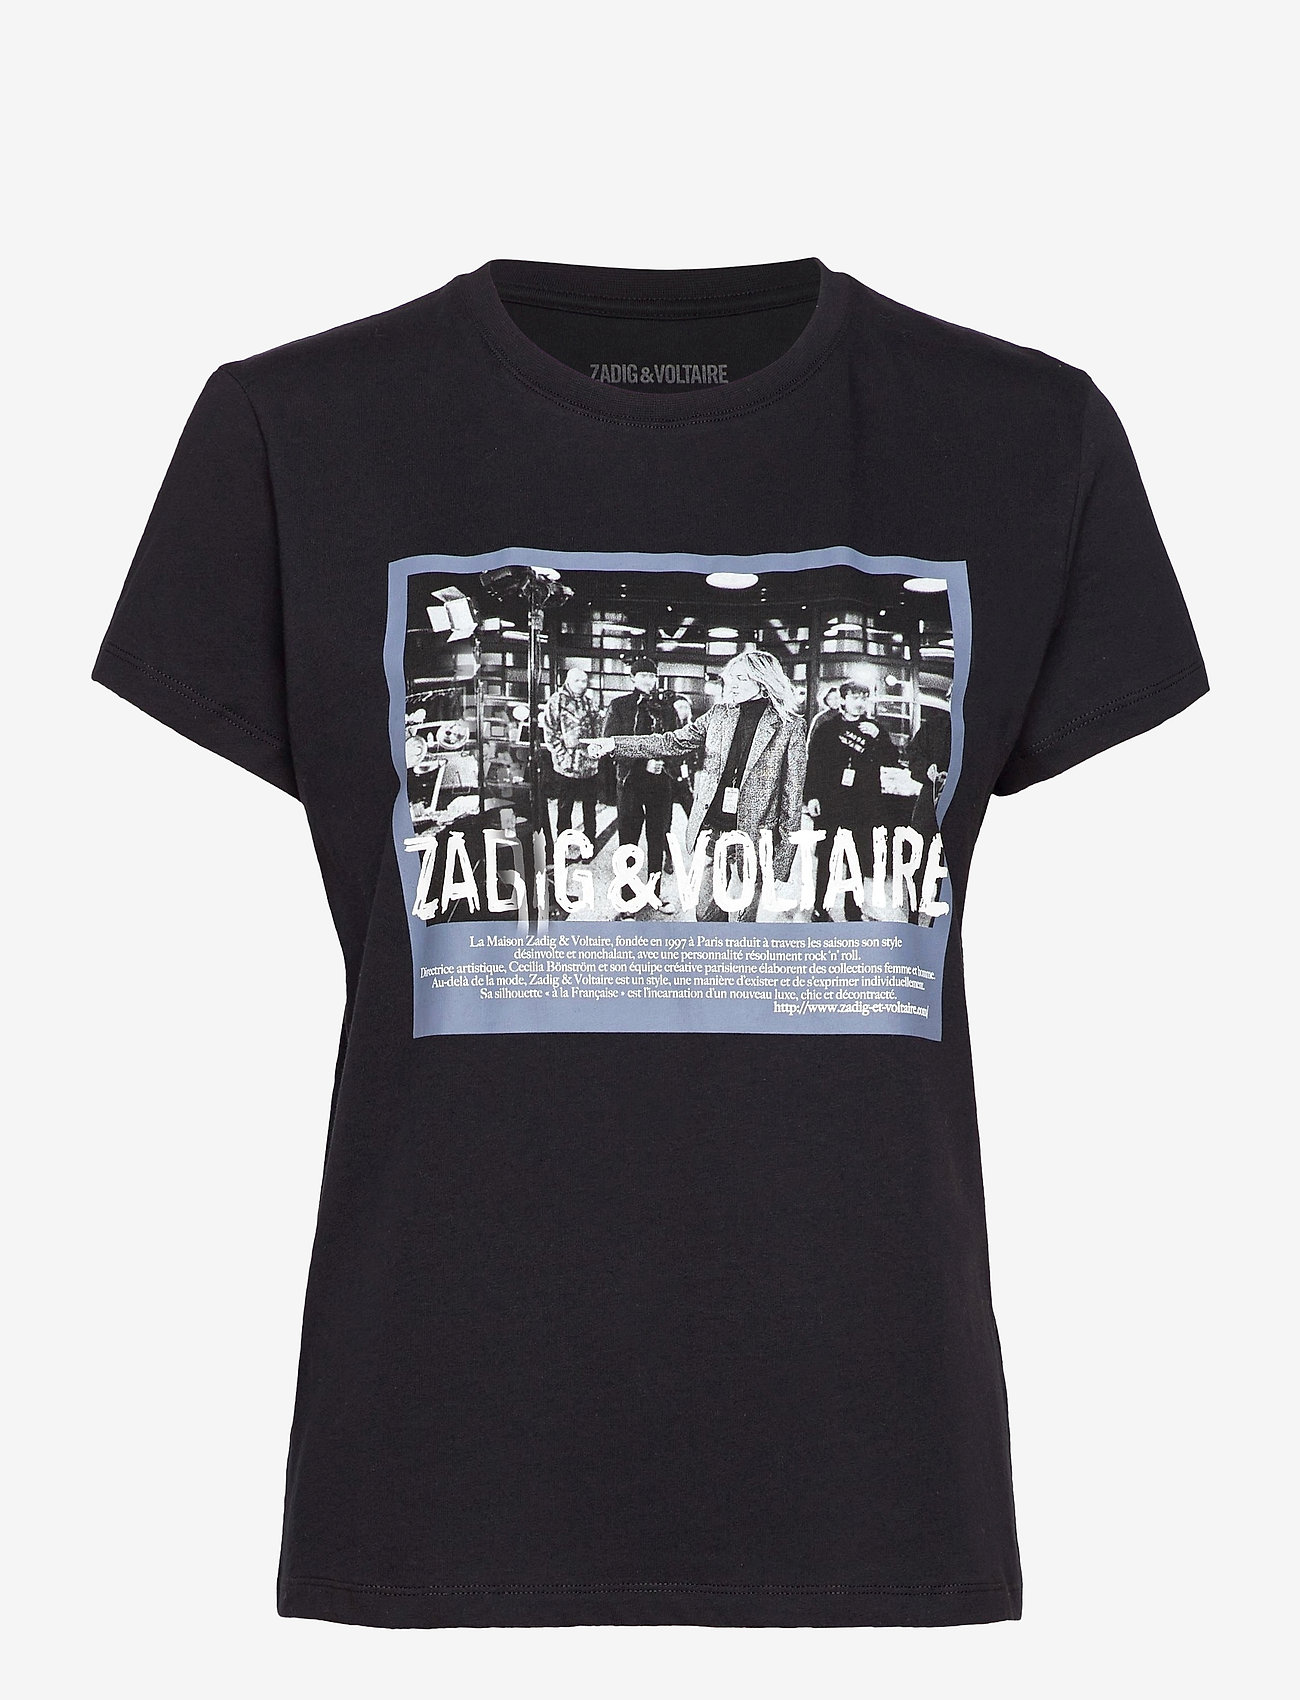 Zadig & Voltaire - ZOE PHOTOPRINT PRINTED T-SHIRT - t-shirts - black - 1